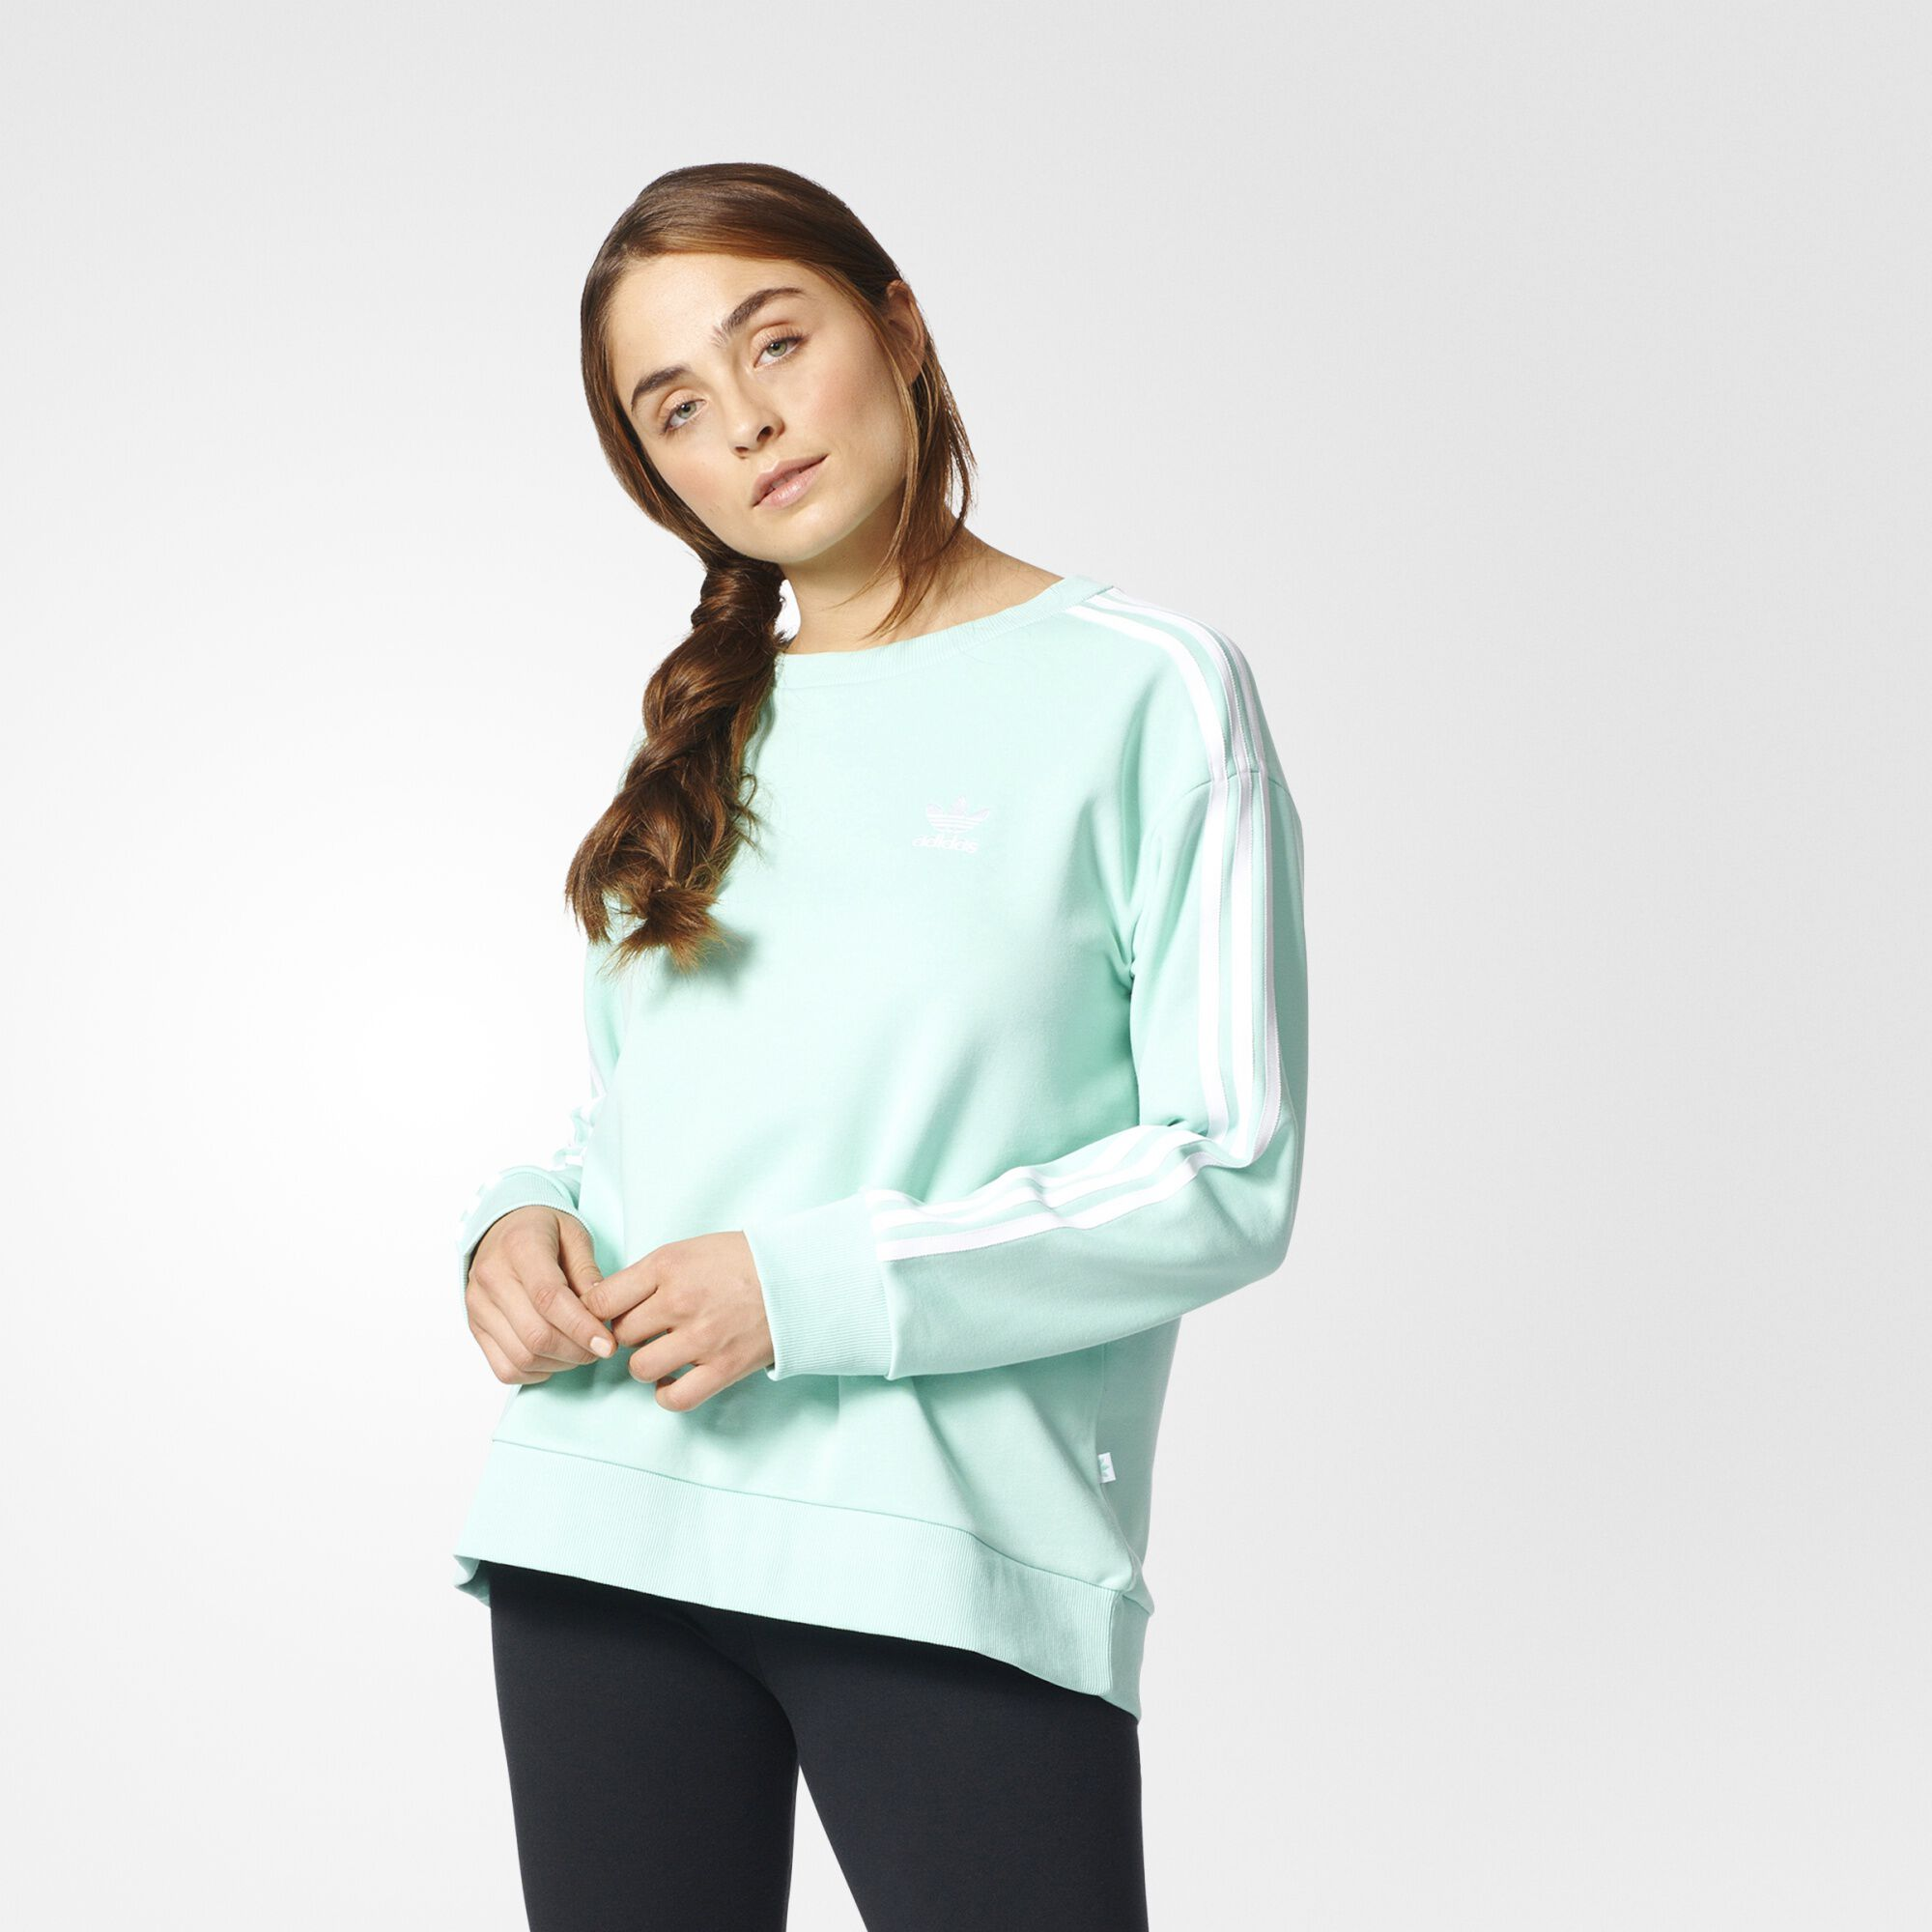 b365663f599 Buy adidas sweatsuit womens 2017   OFF41% Discounted